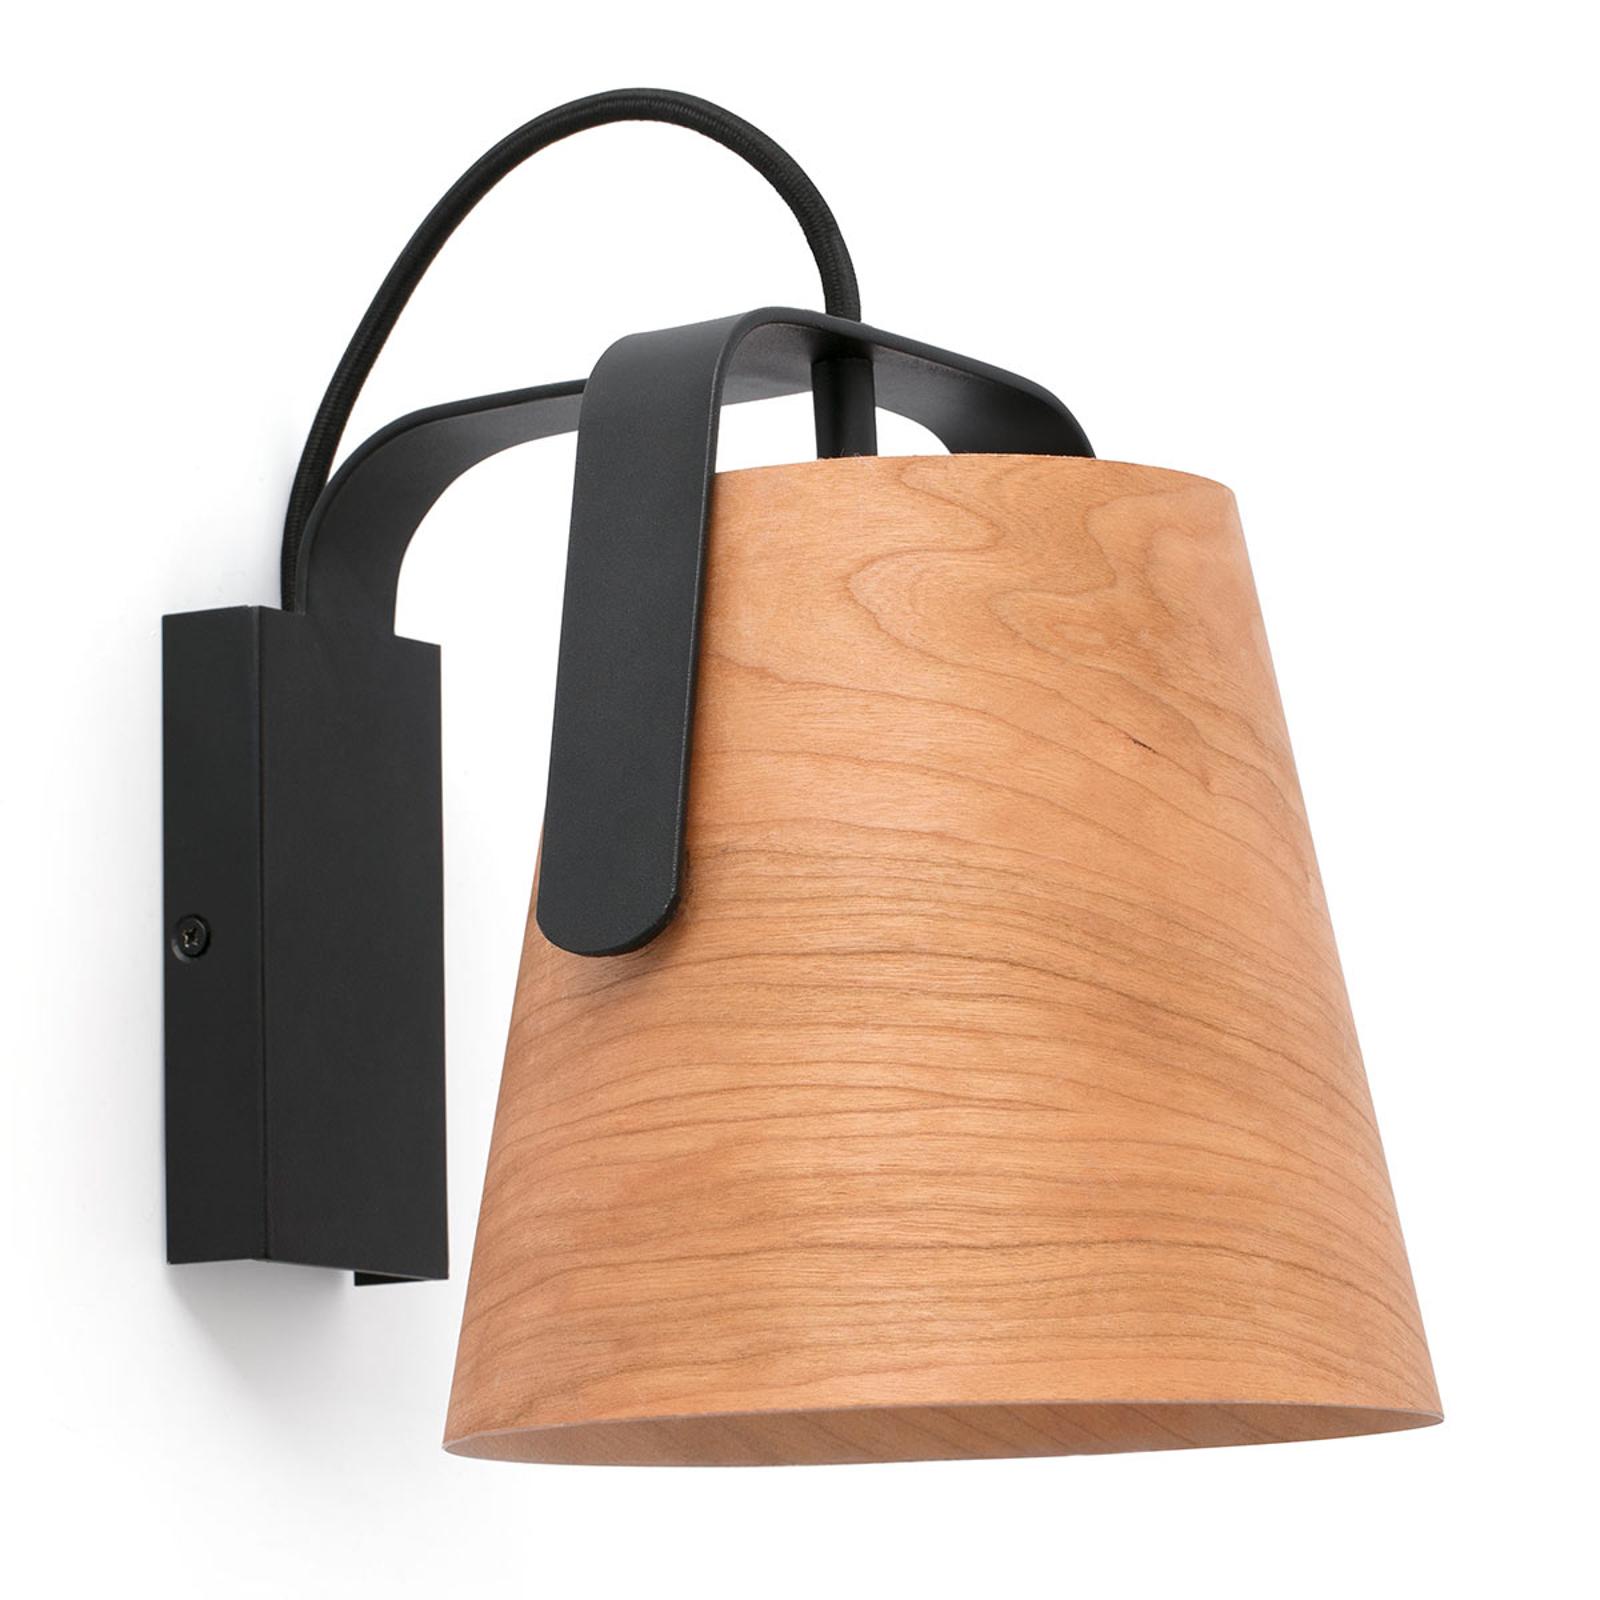 Wandlamp Stood met kersenhouten lampenkap